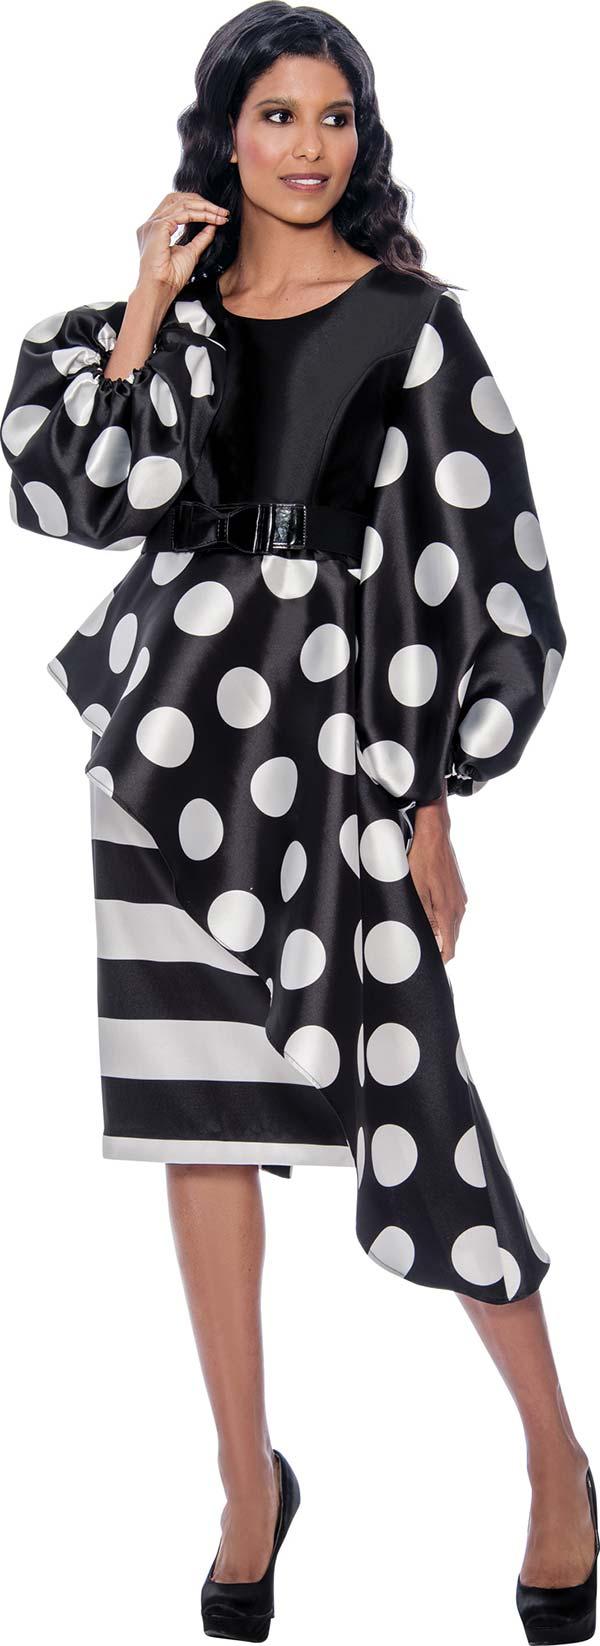 Nubiano Dresses DN2521-BlackWhite - Polka Dot & Stripe Print Half Peplum Dress With Belt